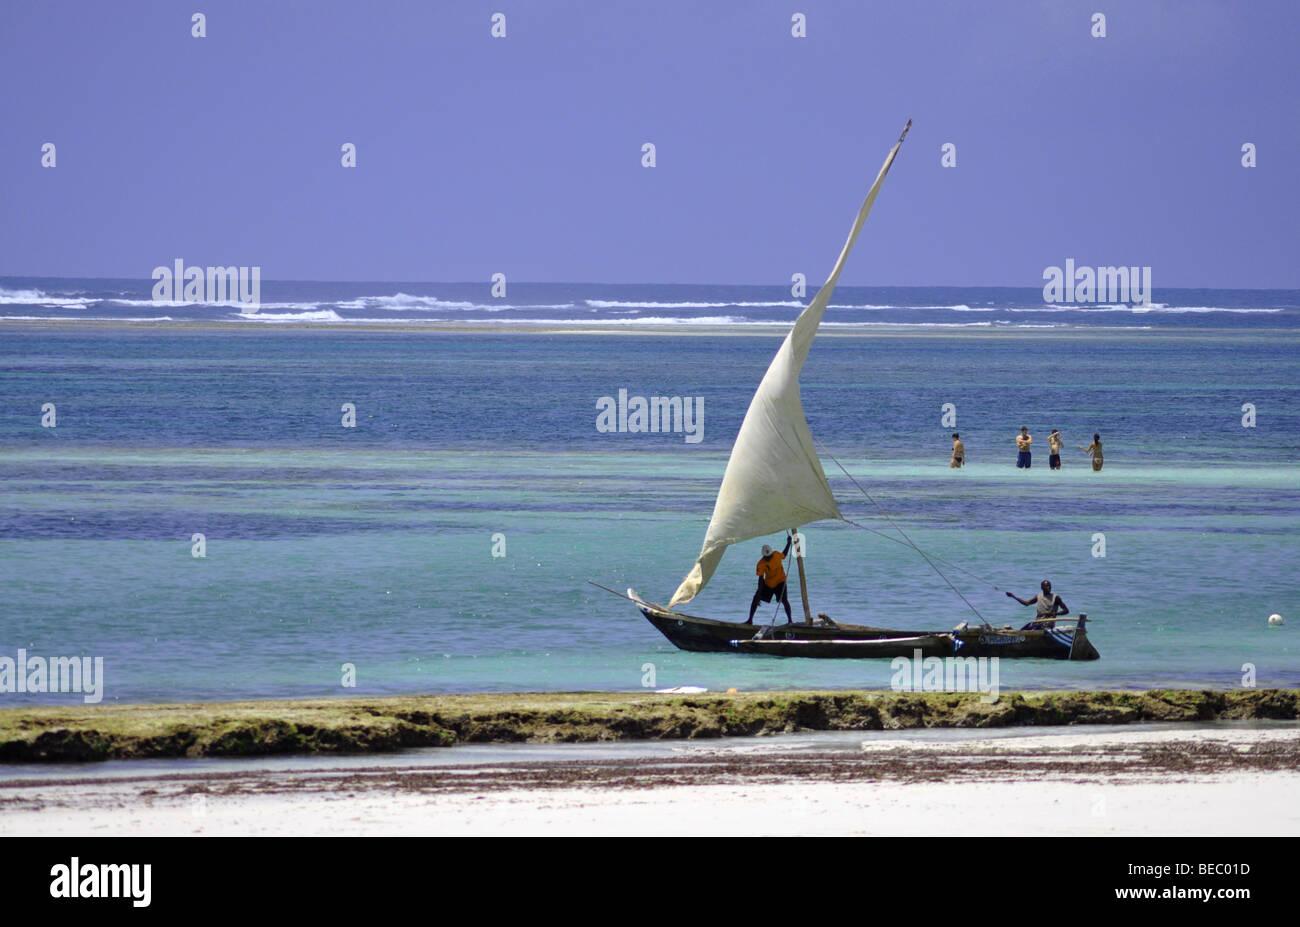 Diani Beach Kenya Africa - Stock Image